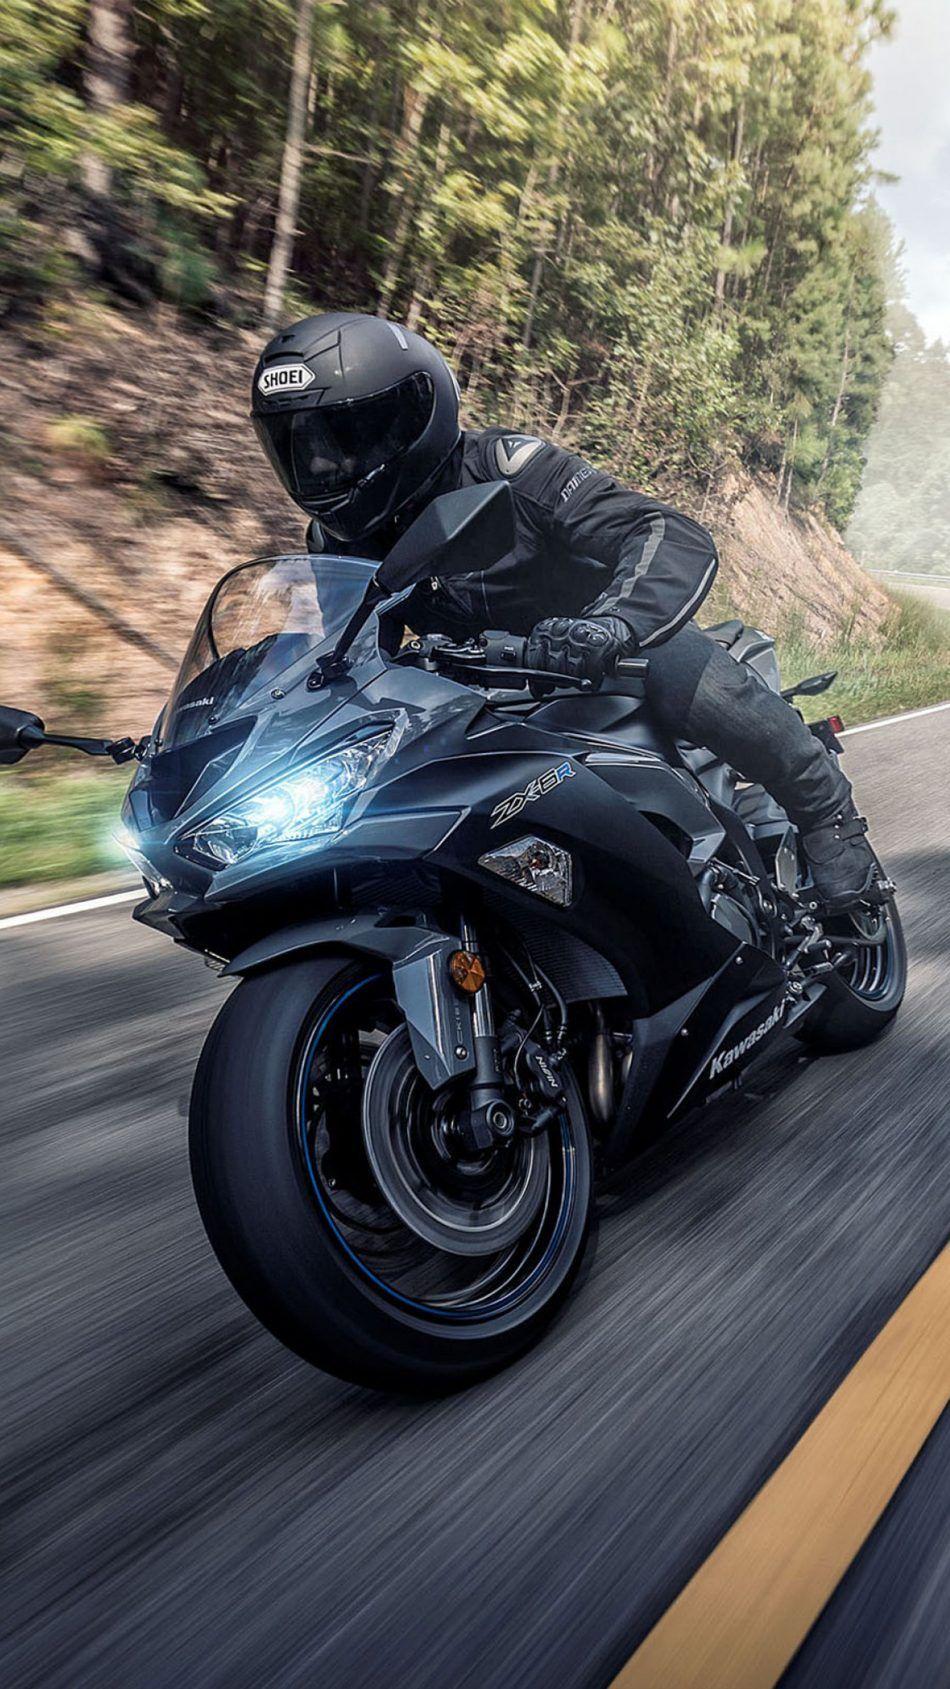 Kawasaki Ninja Zx 6r 2019 With Images Kawasaki Bikes Ninja